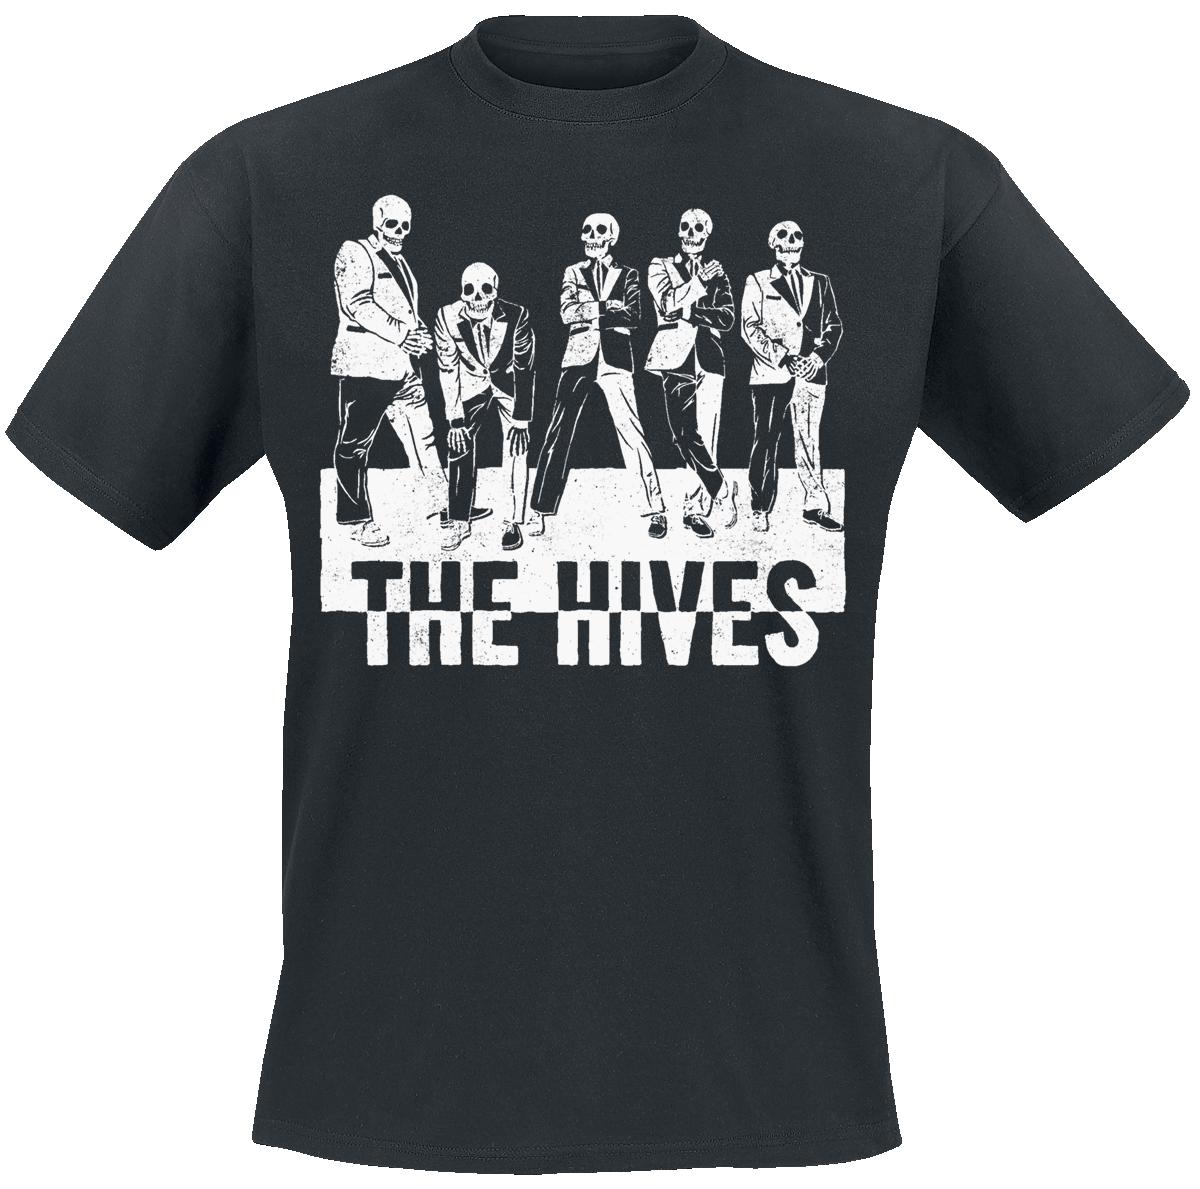 The Hives - Skeletons - T-Shirt - black image